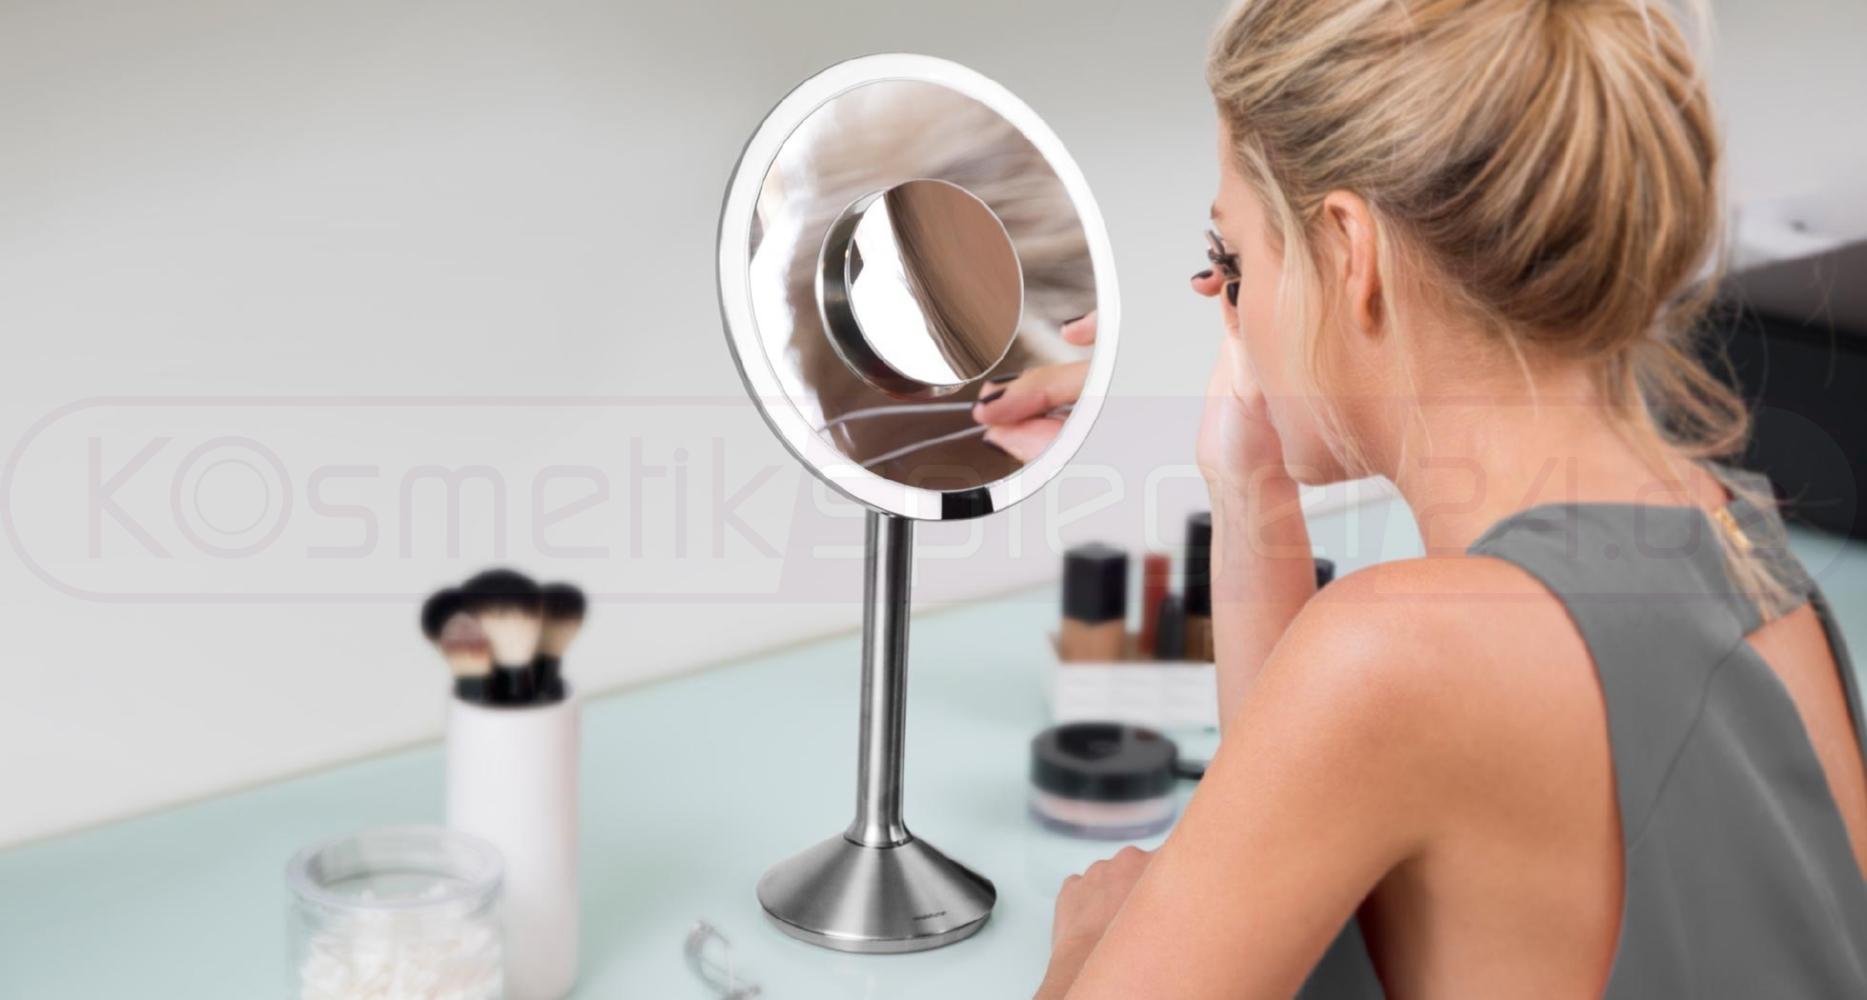 Kosmetikspiegel Online Kaufen Maedje Kg Led